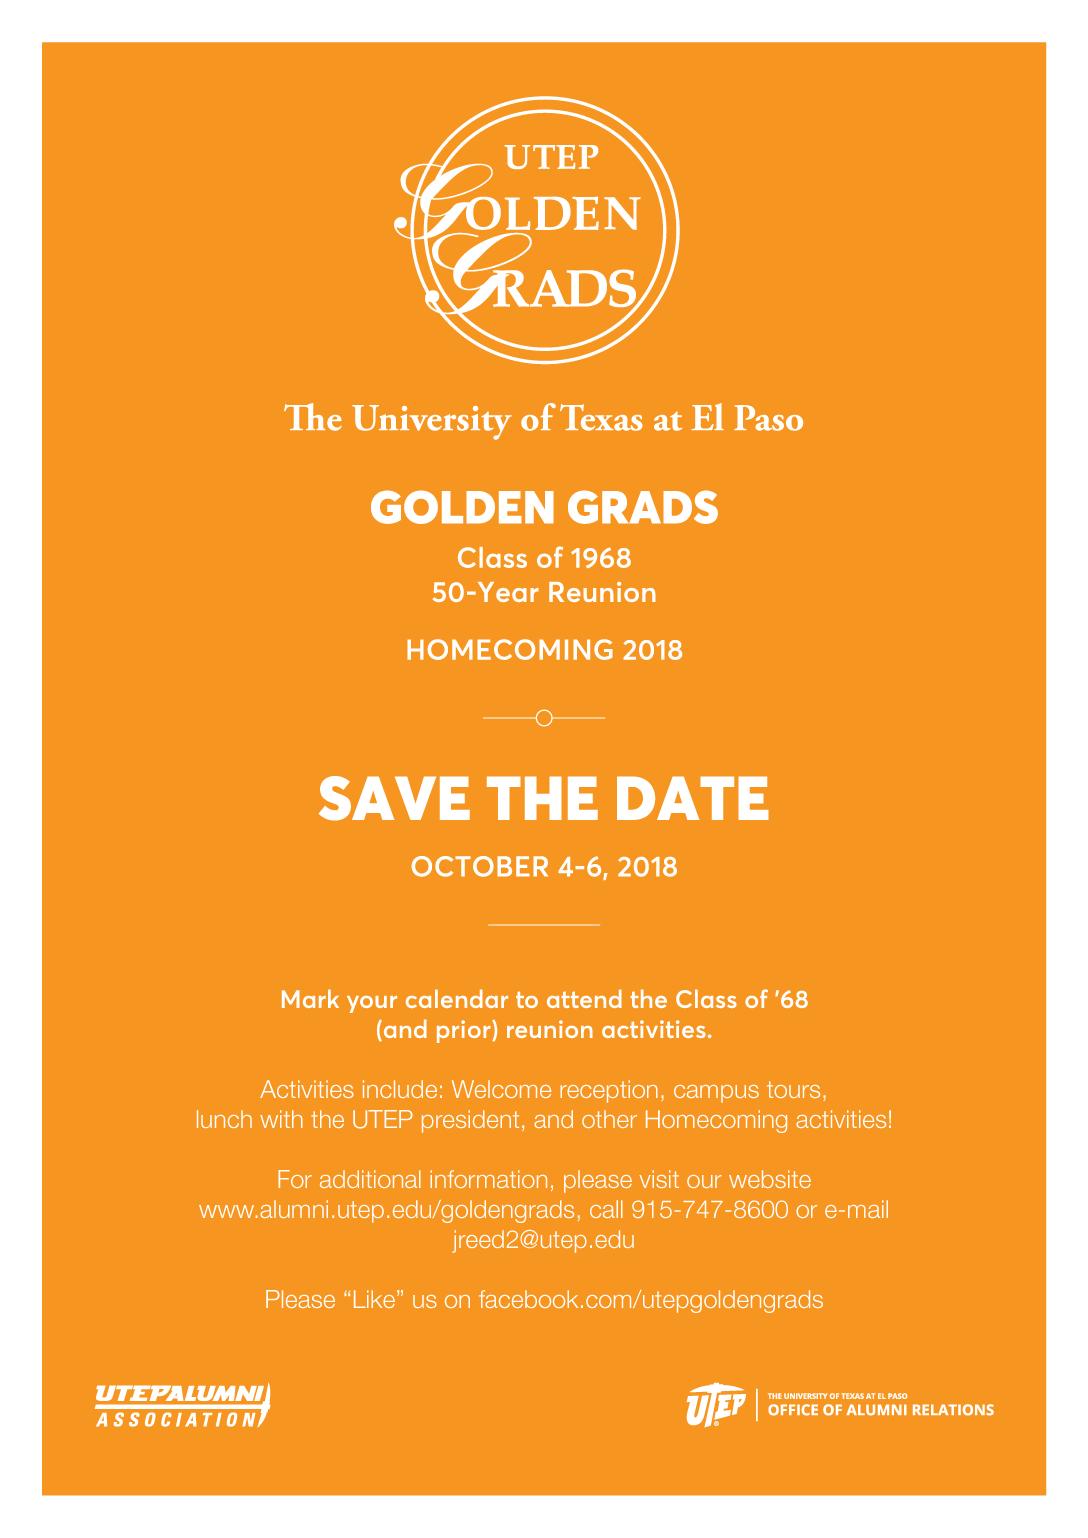 UTEP Golden Grads - The University of Texas at El Paso